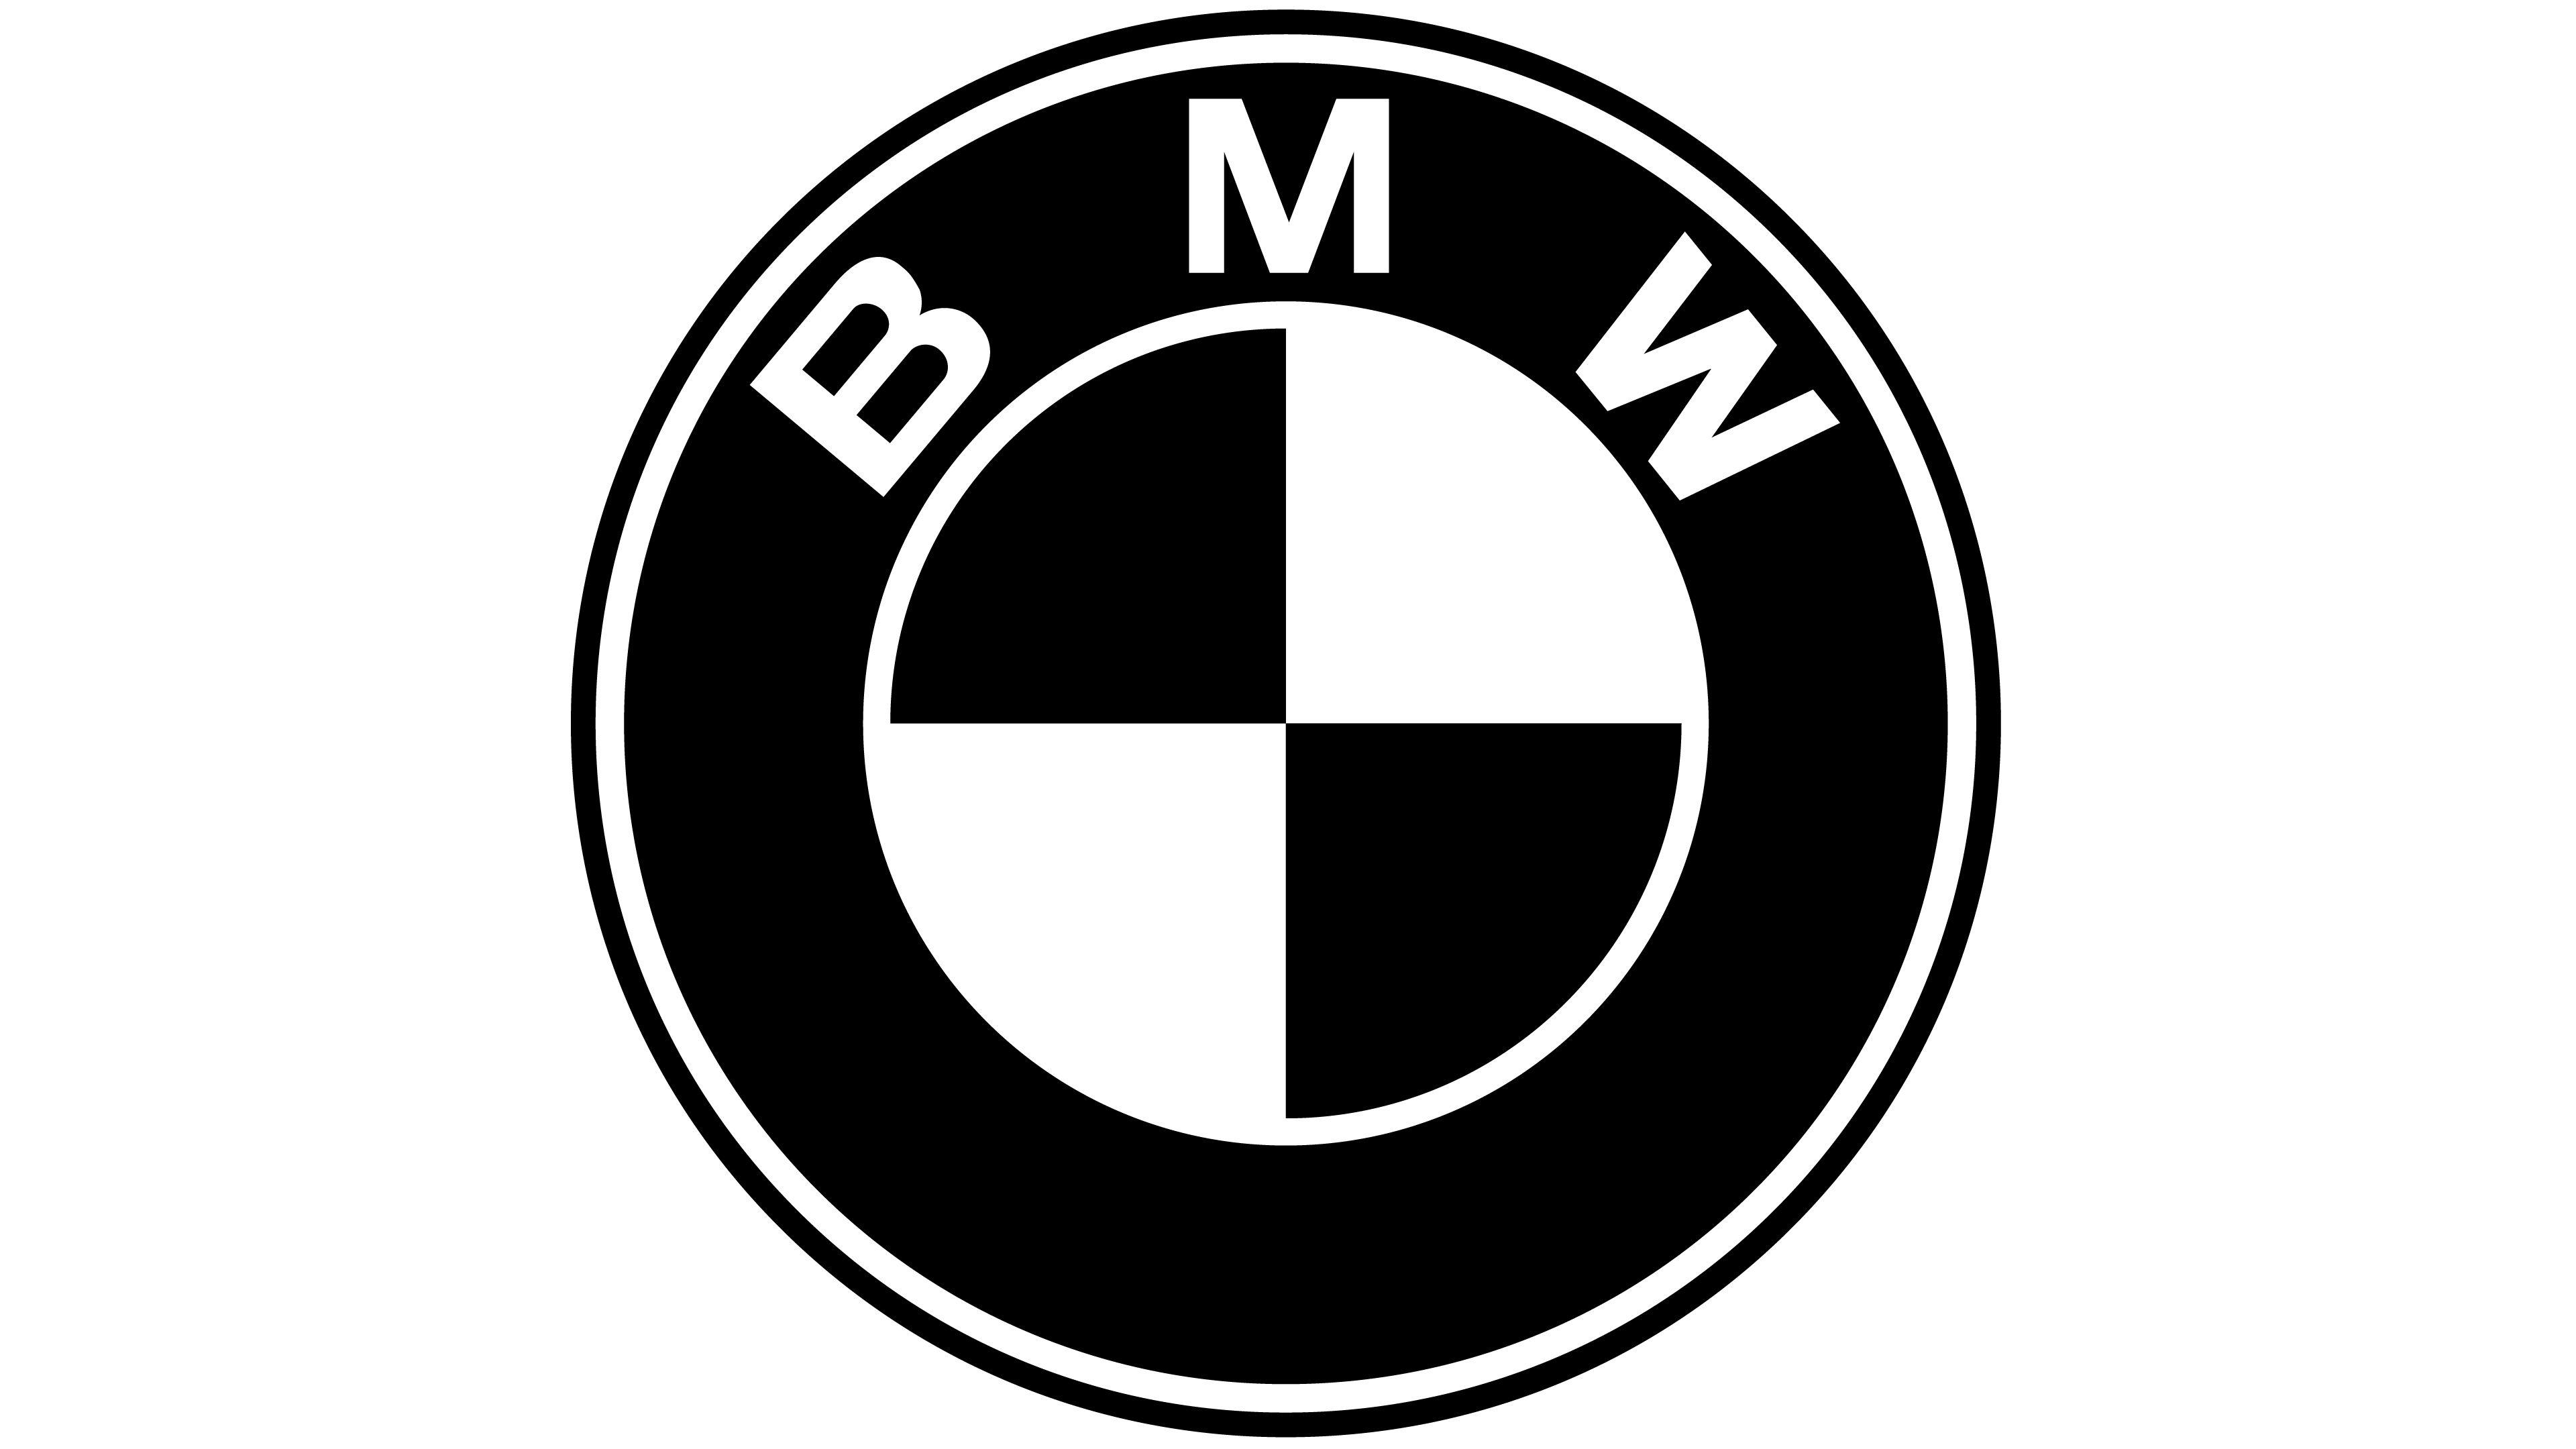 Bmw emblem schwarz Vinilo